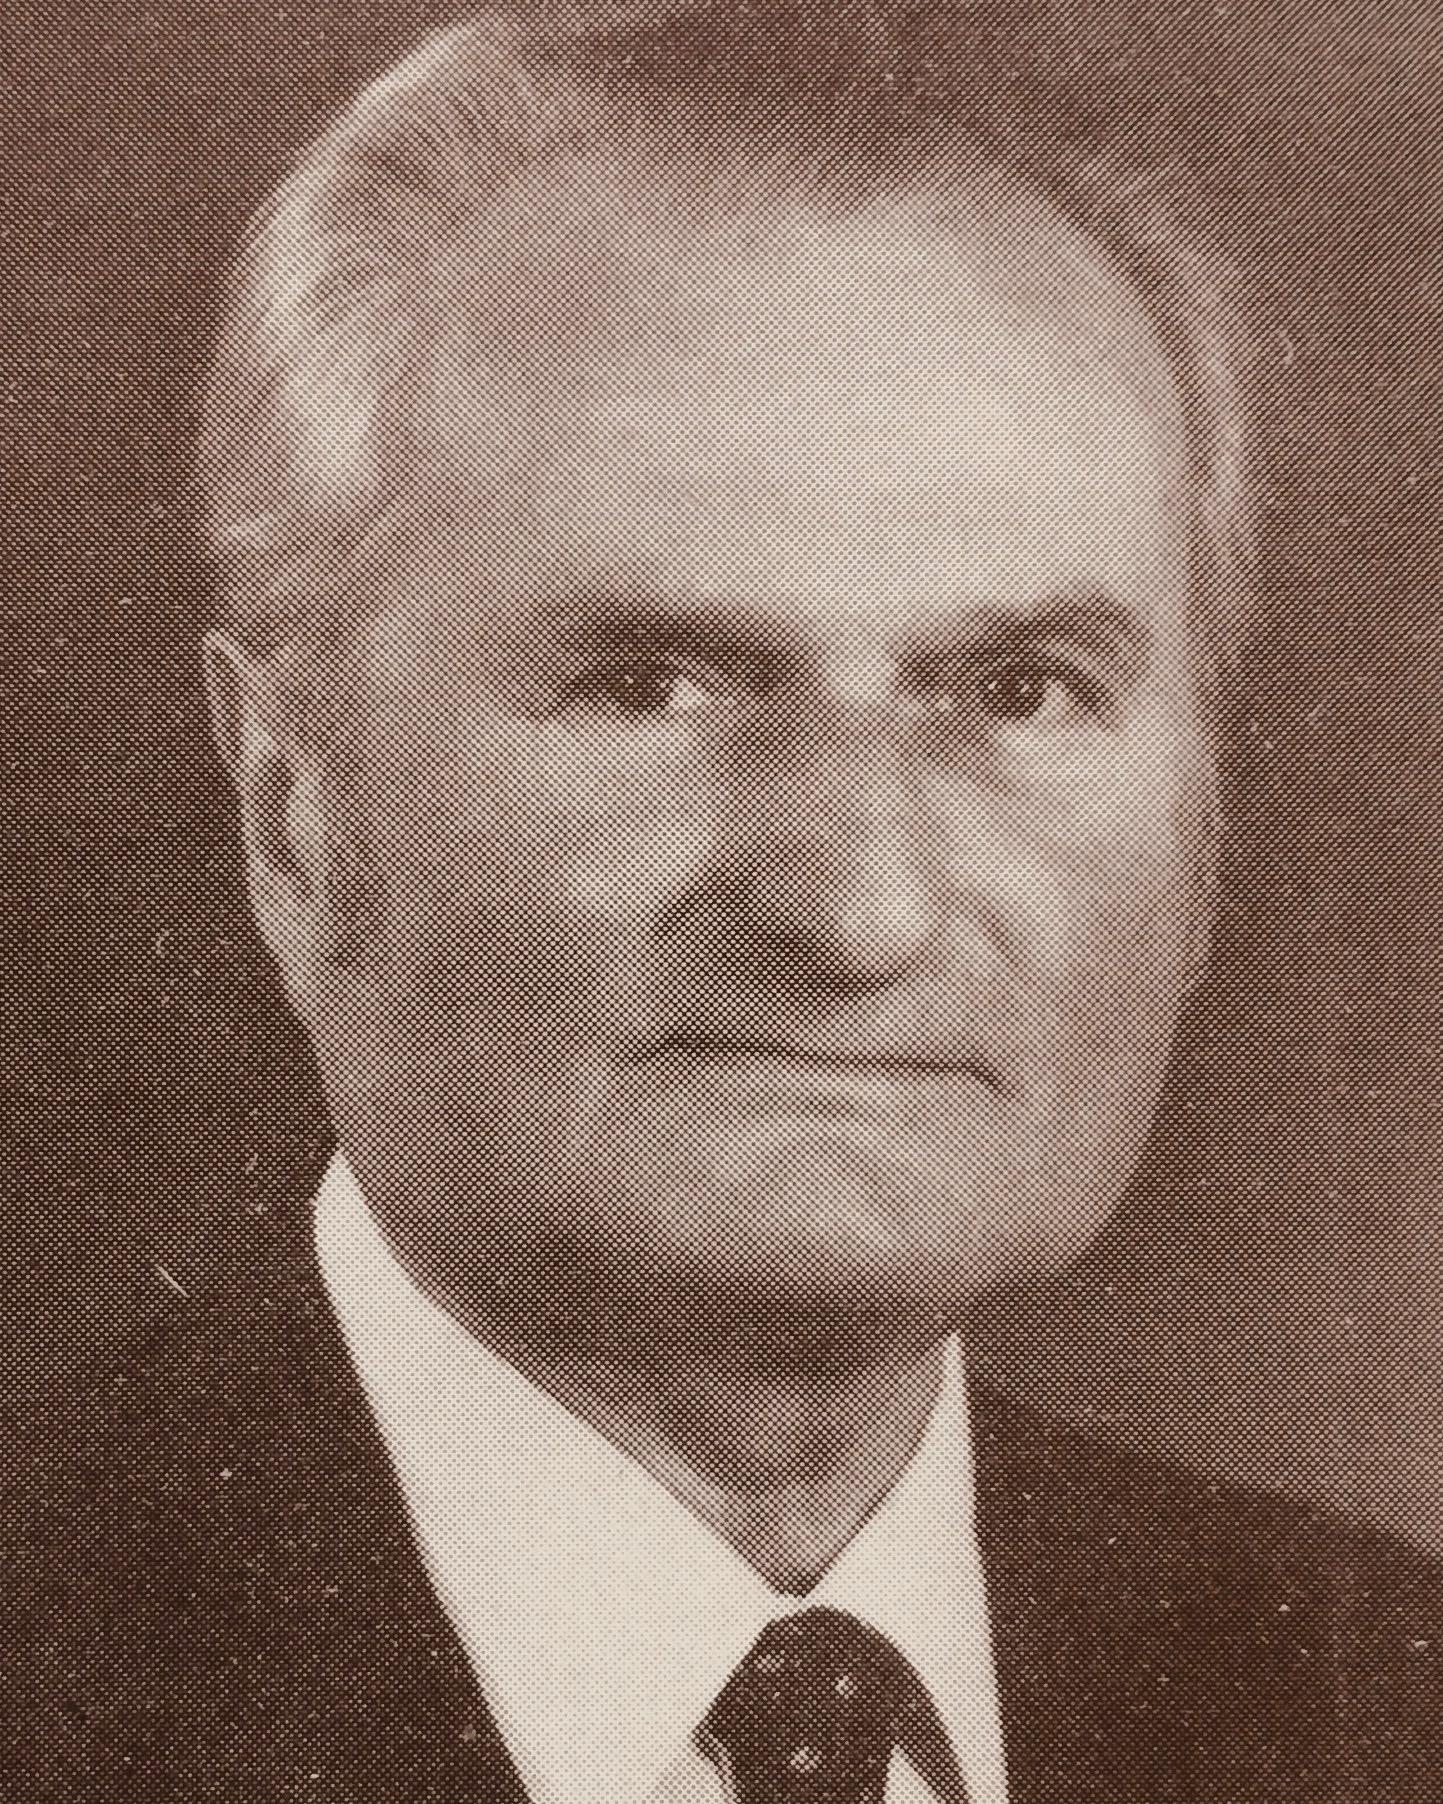 Hans Helmut Ernst